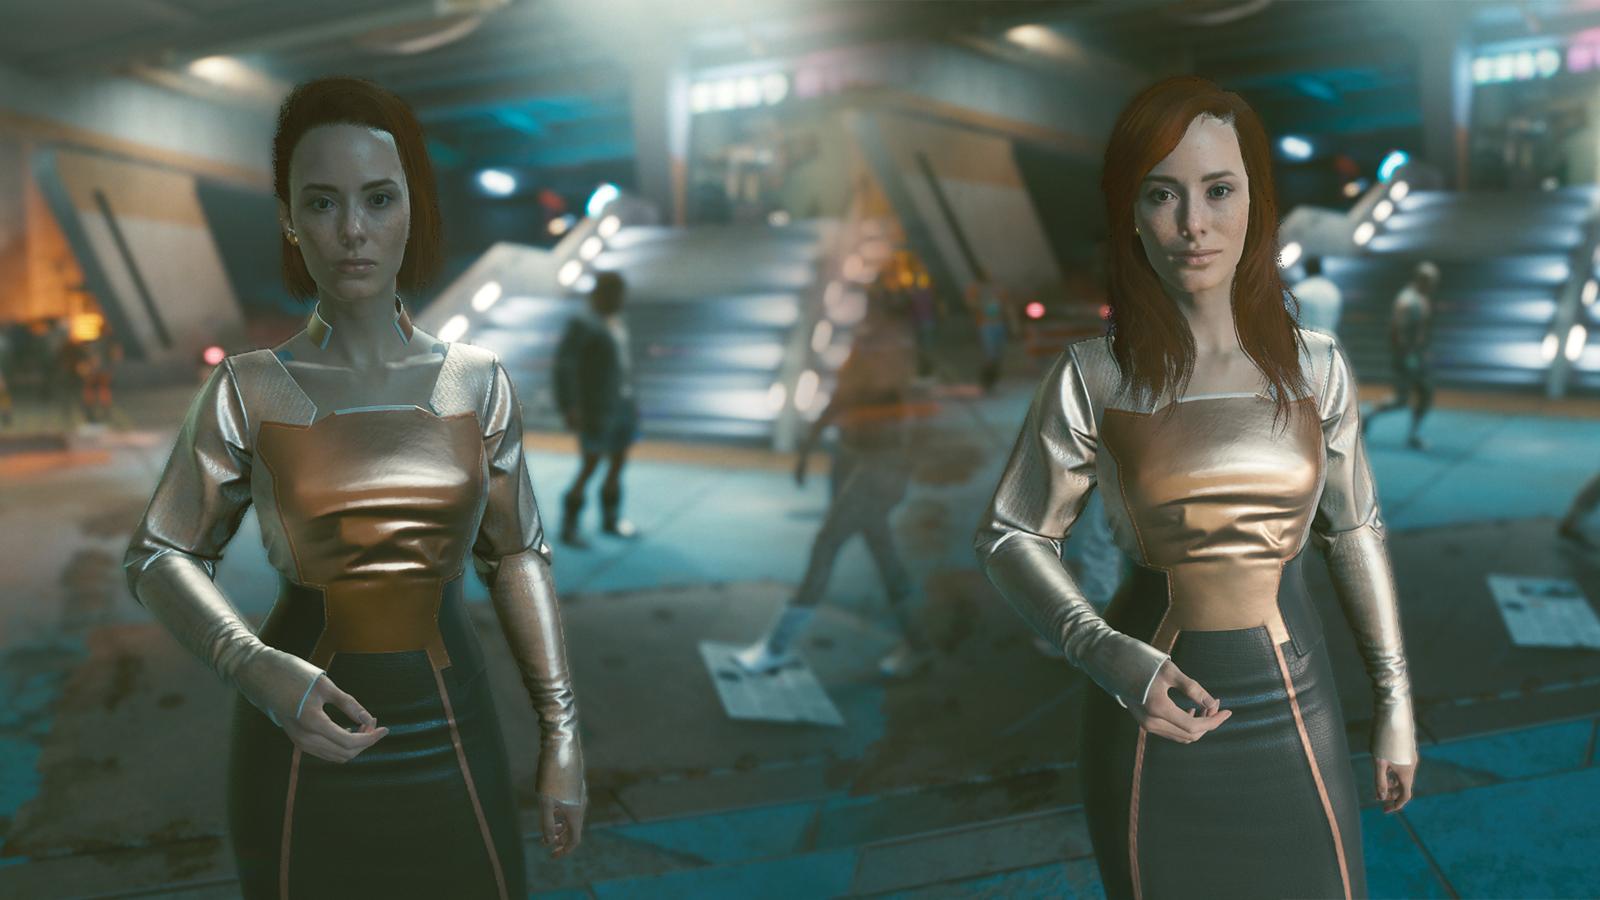 Hairstyle changer mod in Cyberpunk 2077